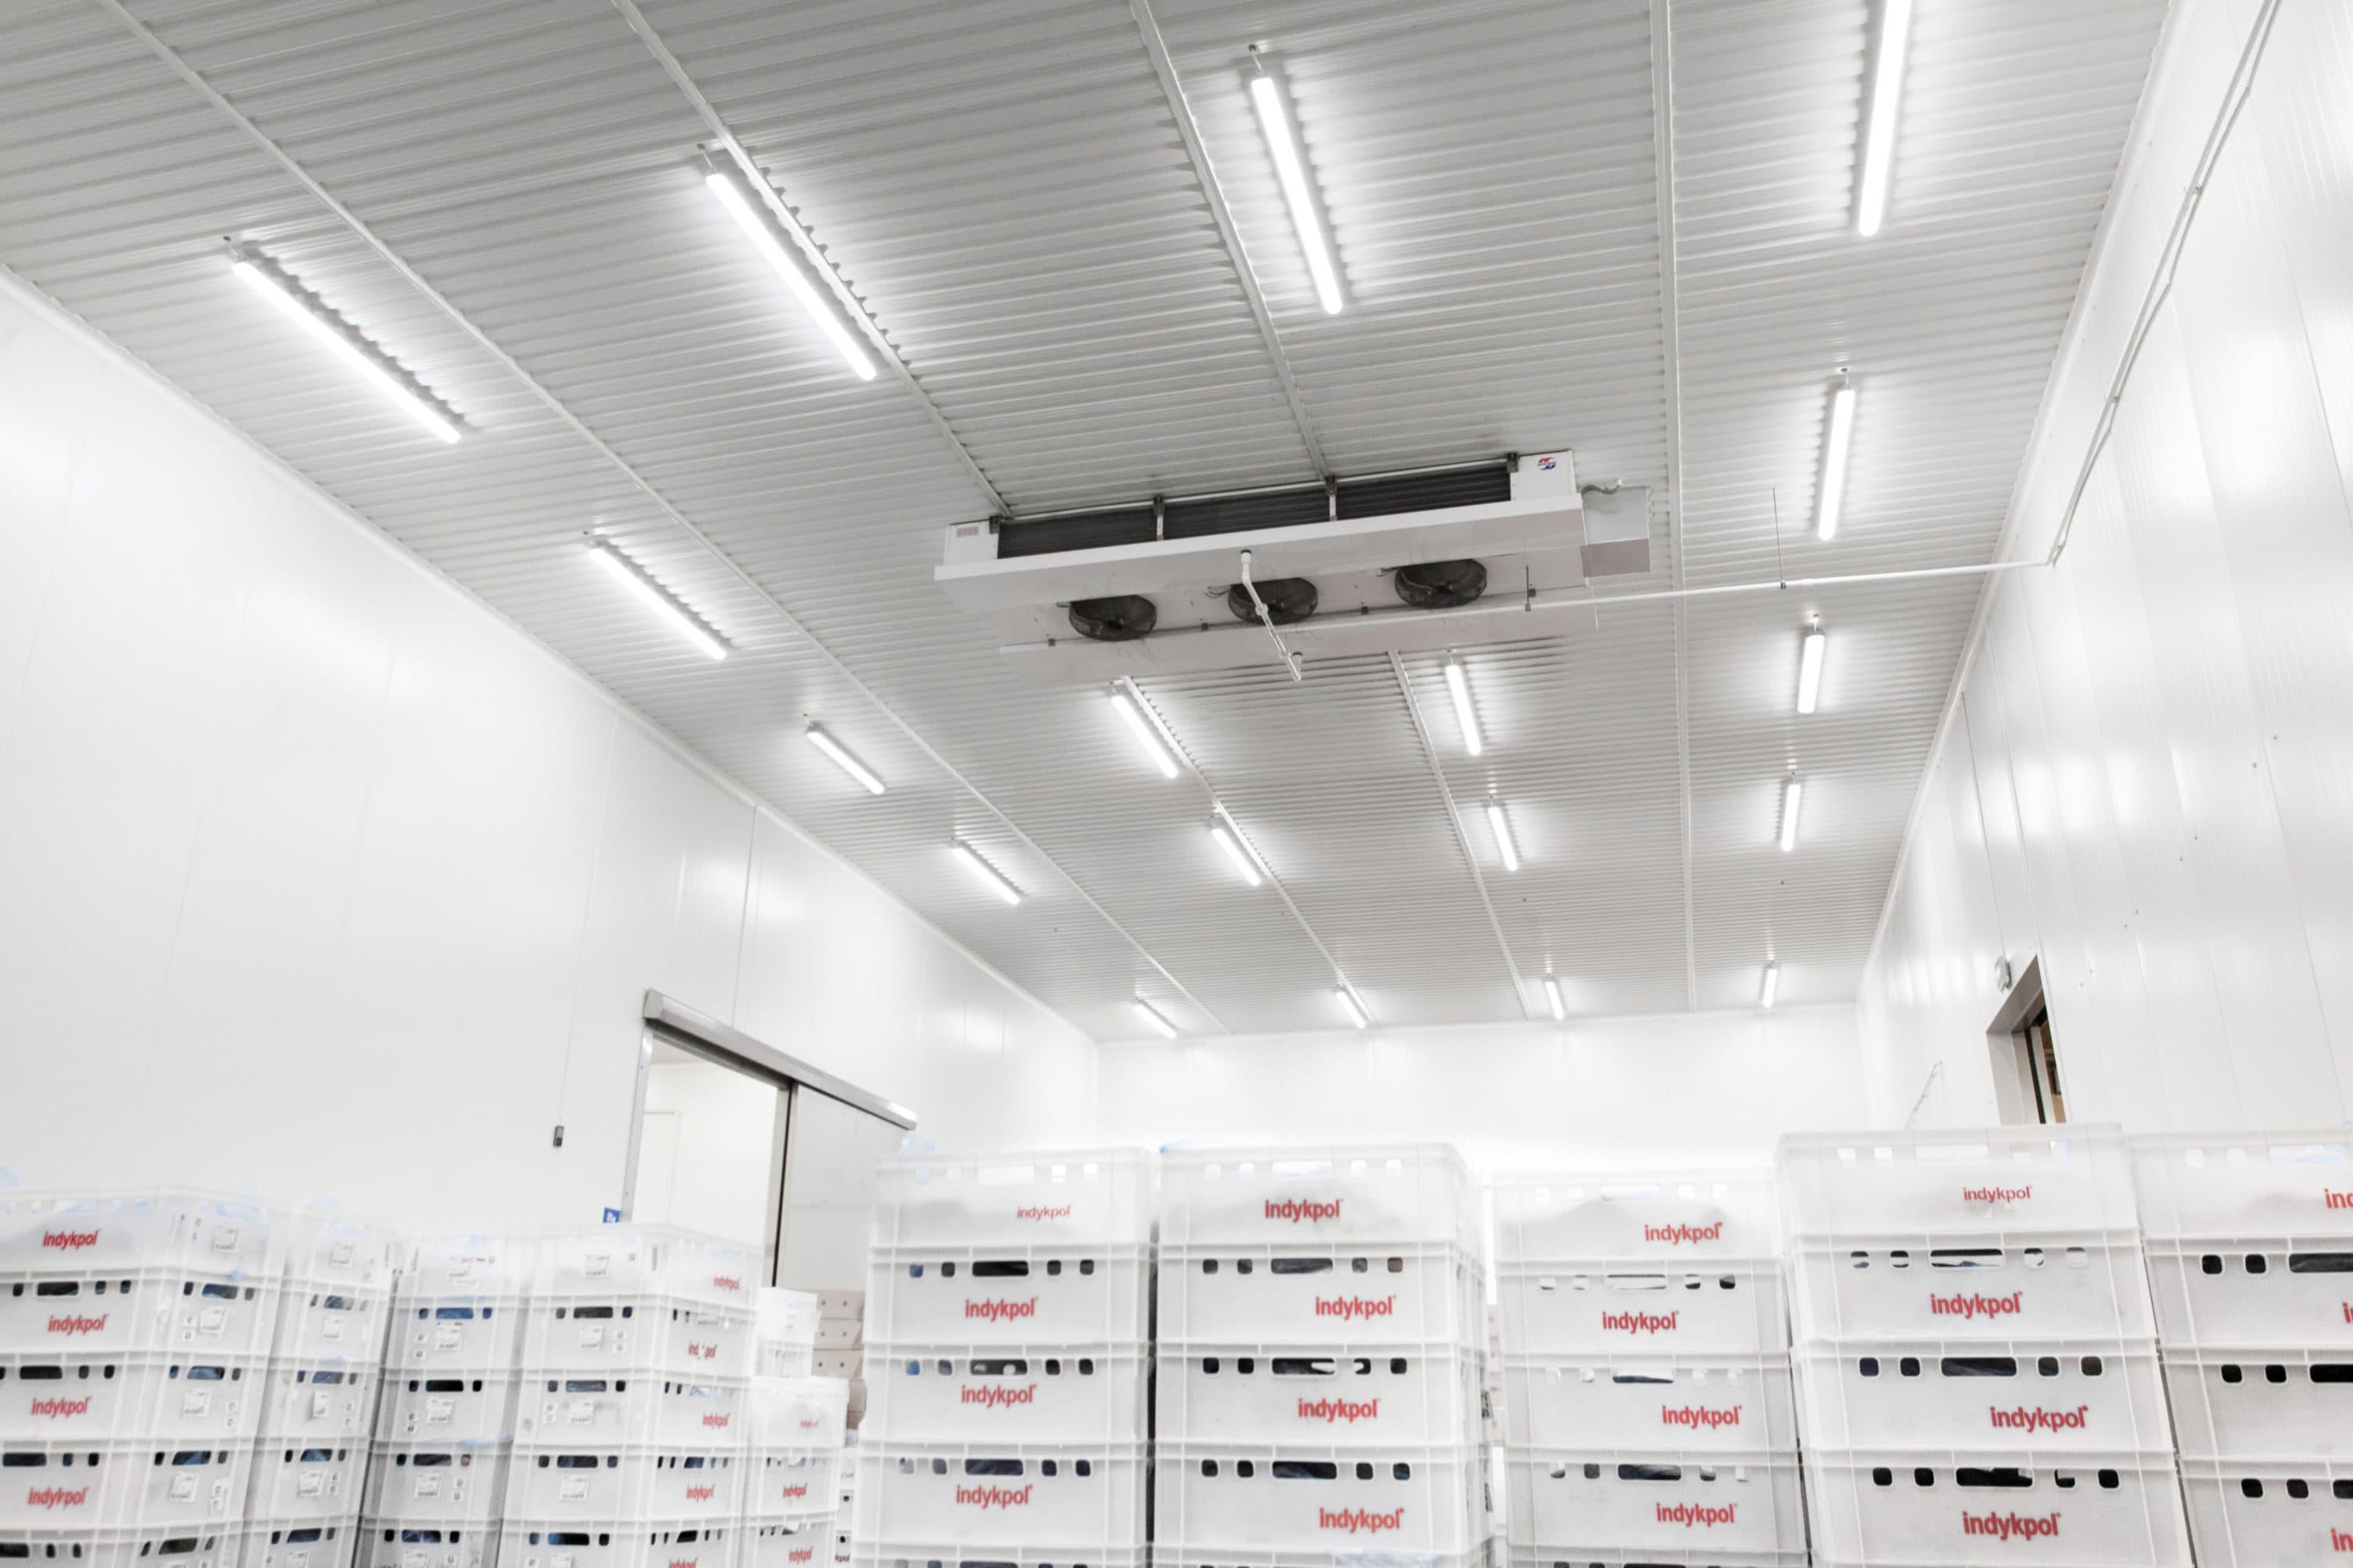 Modernisation of lighting in Indykpol